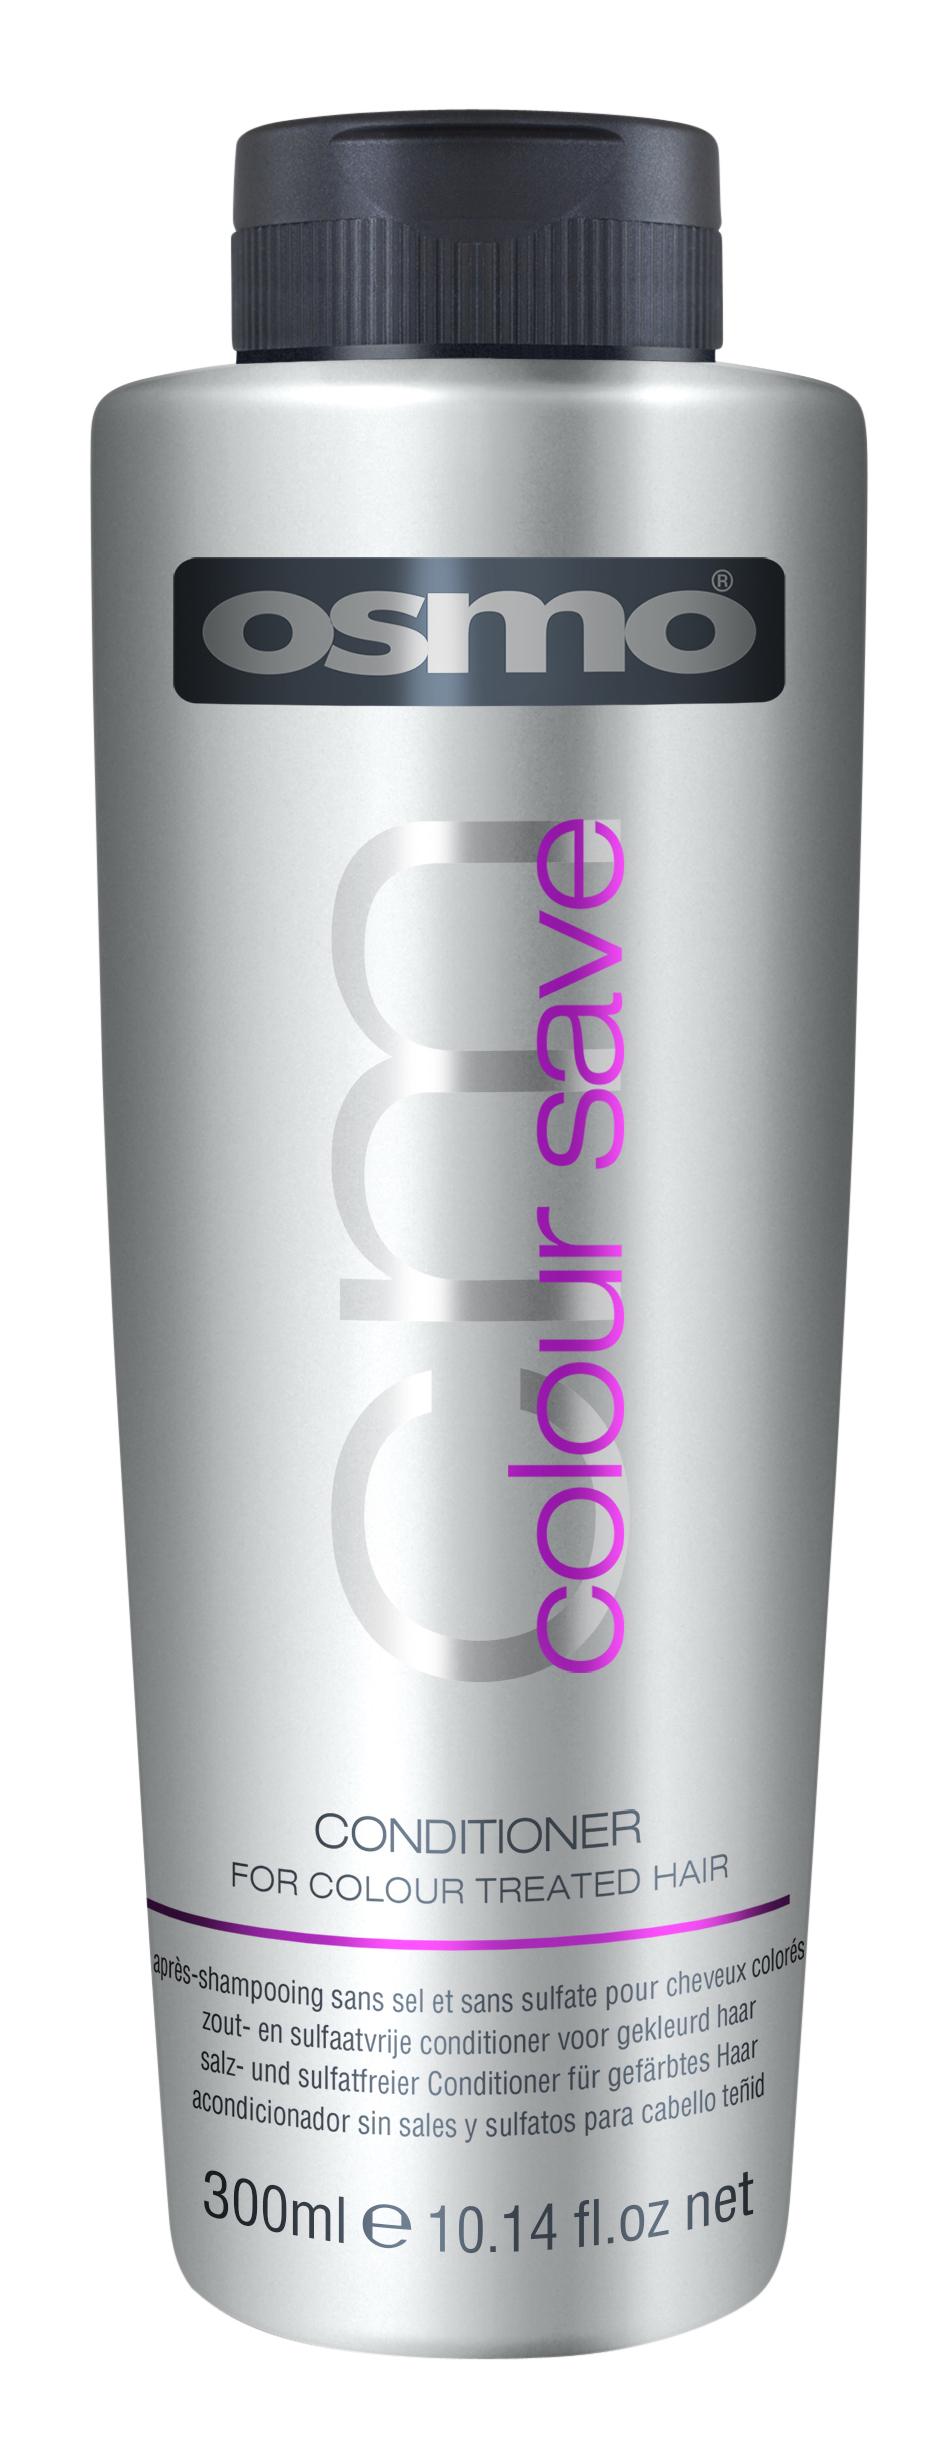 OSMO Кондиционер для окрашенных волос Сохранение цвета / Color Save 300мл dji osmo pro raw focus handwheel for osmo pro osmo raw inspire 2 focus controller flip control knob original accessories